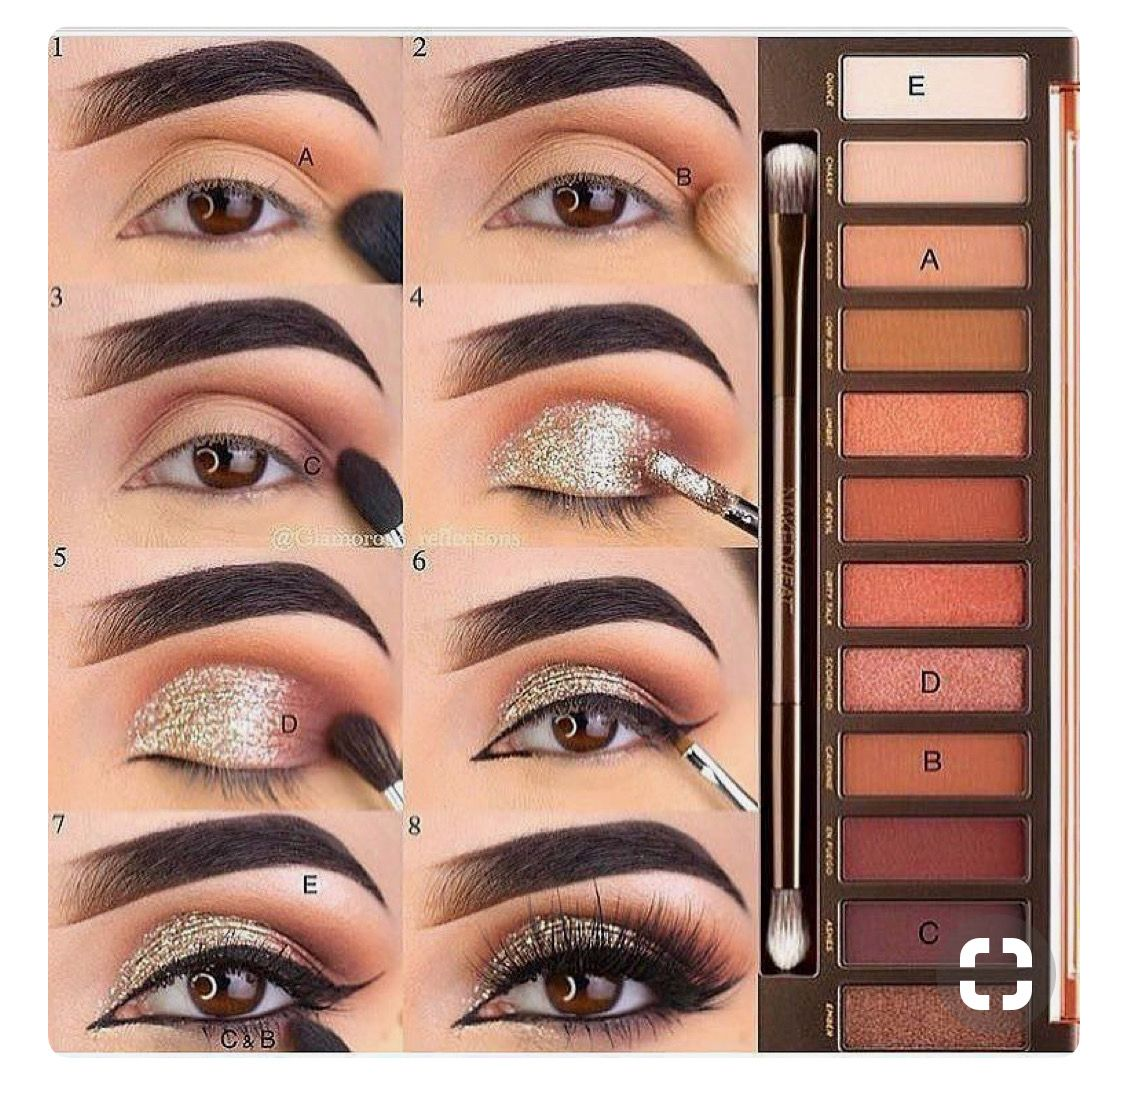 Pin by Britt Dzy on TUTORIELS ️ Pinterest makeup, Eye